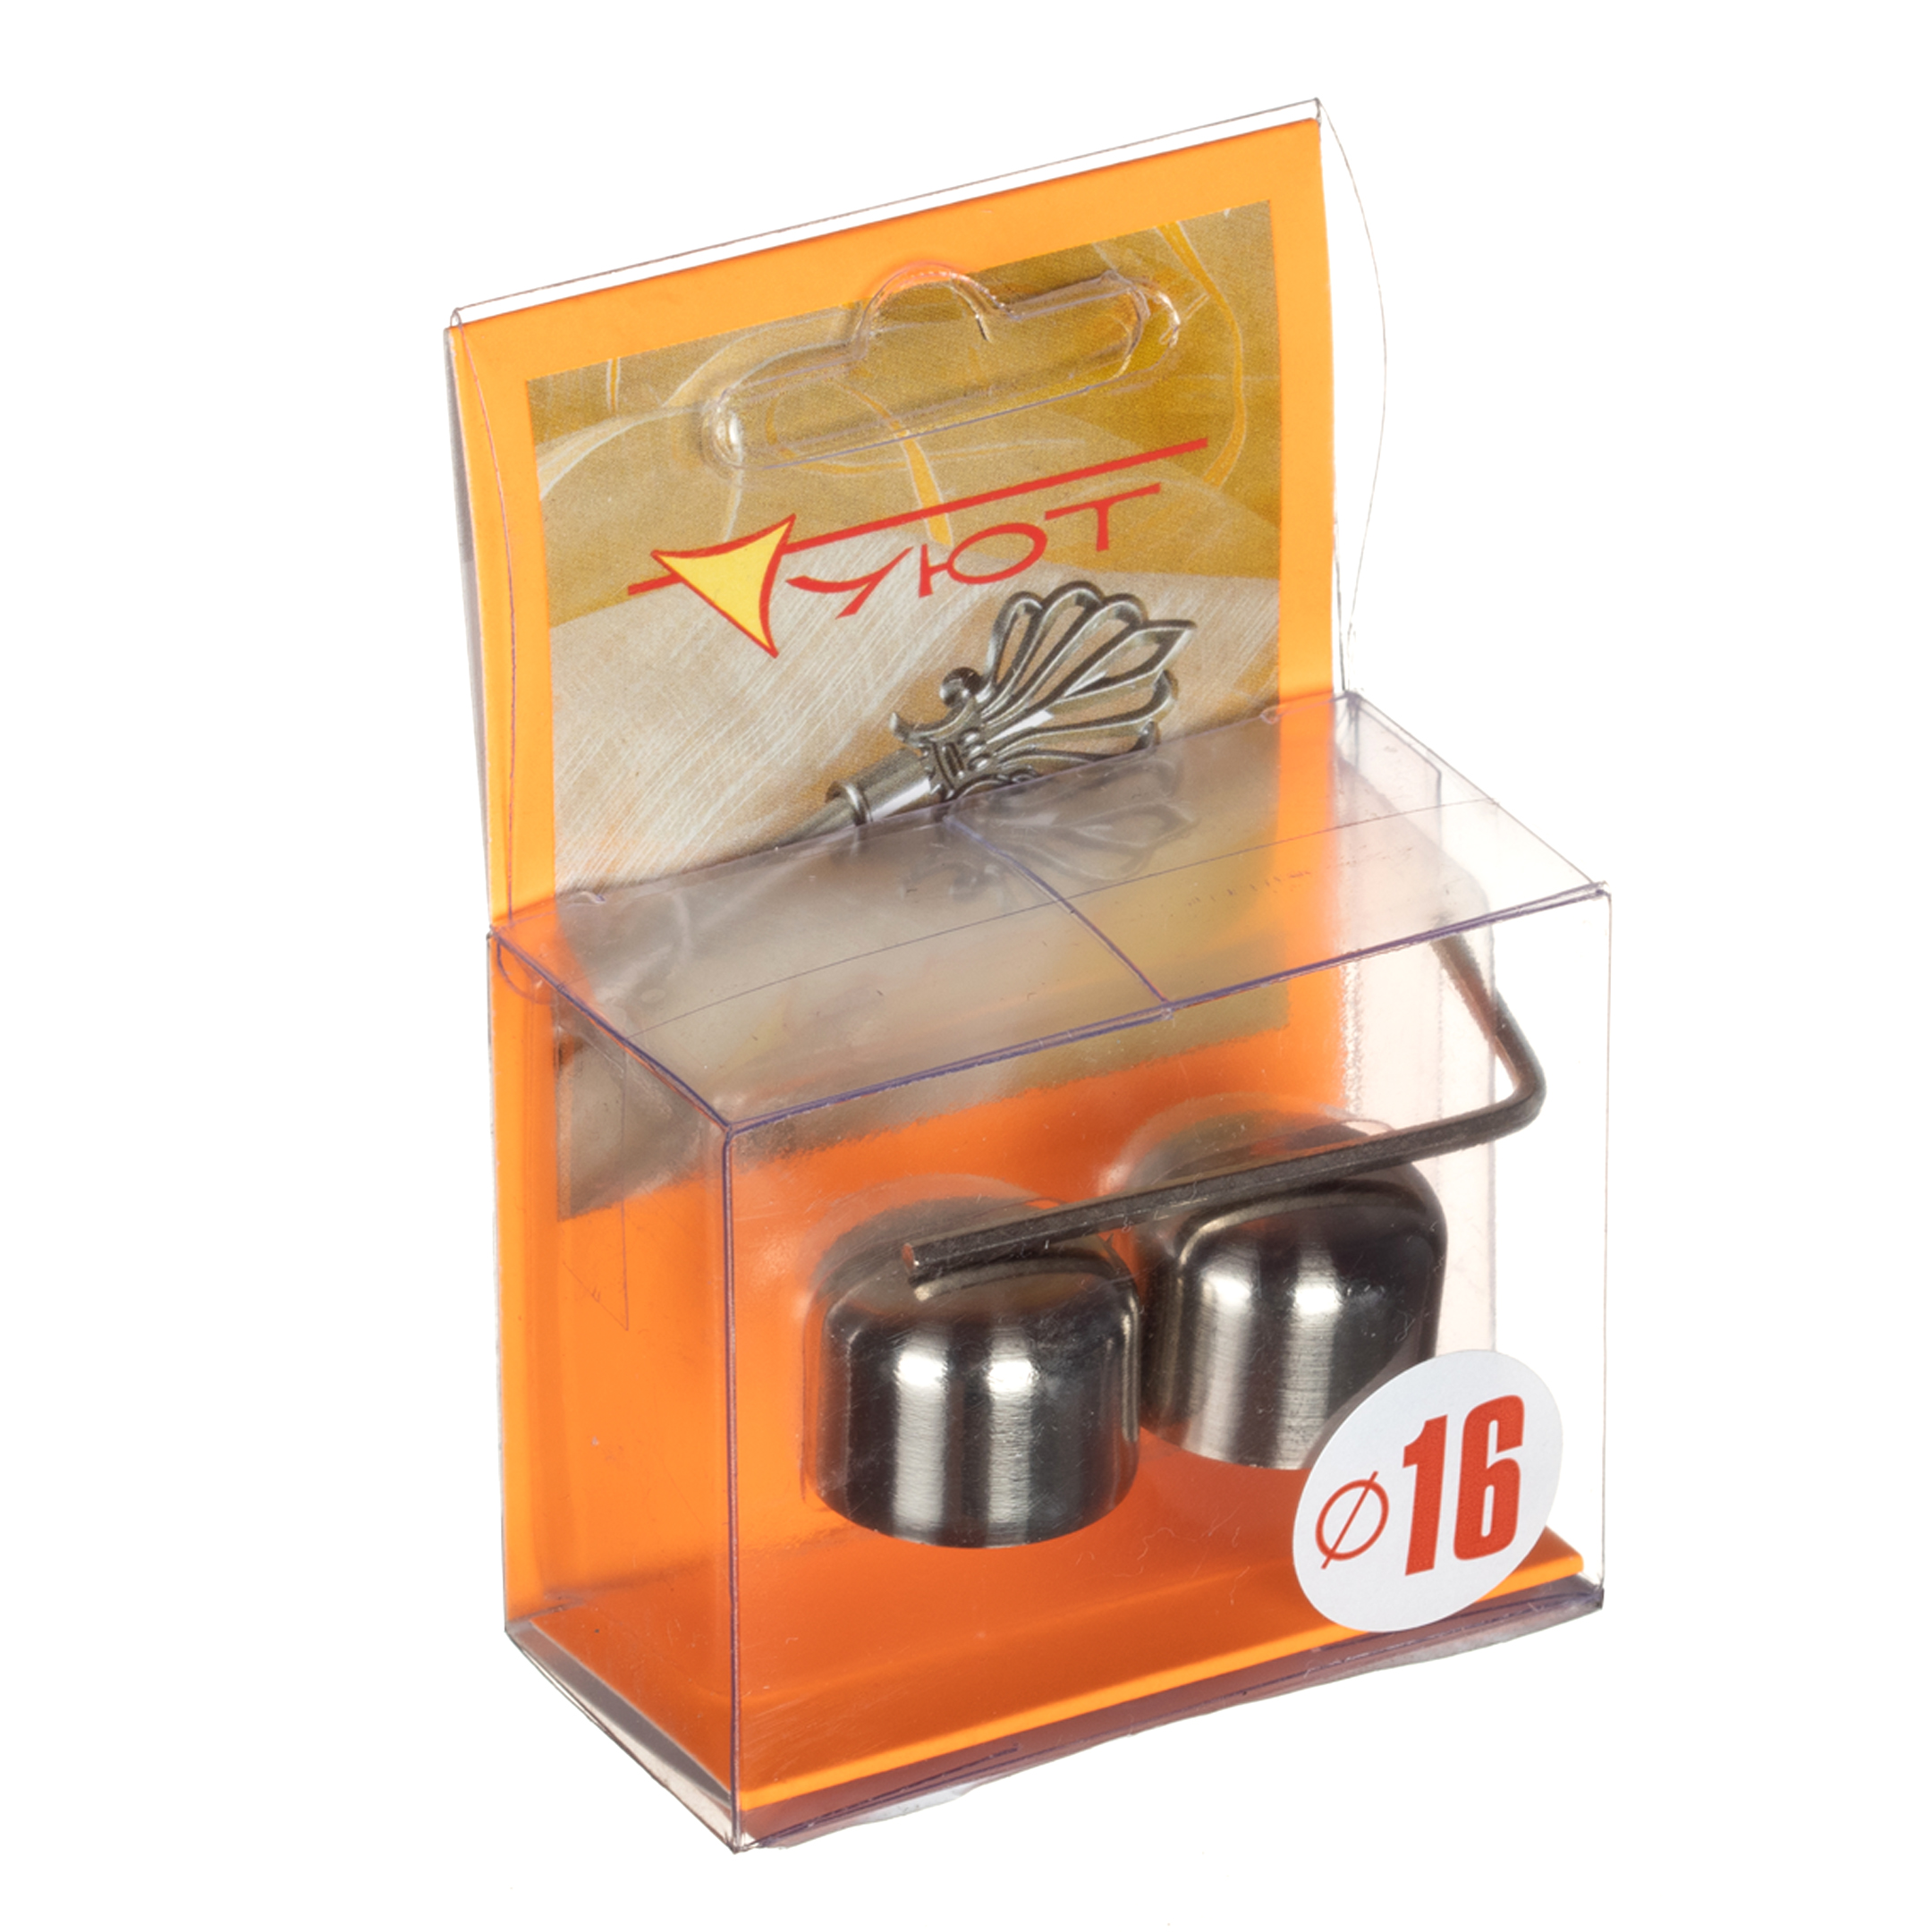 Наконечник-заглушка d 16 мм серебро 2 шт. цены онлайн